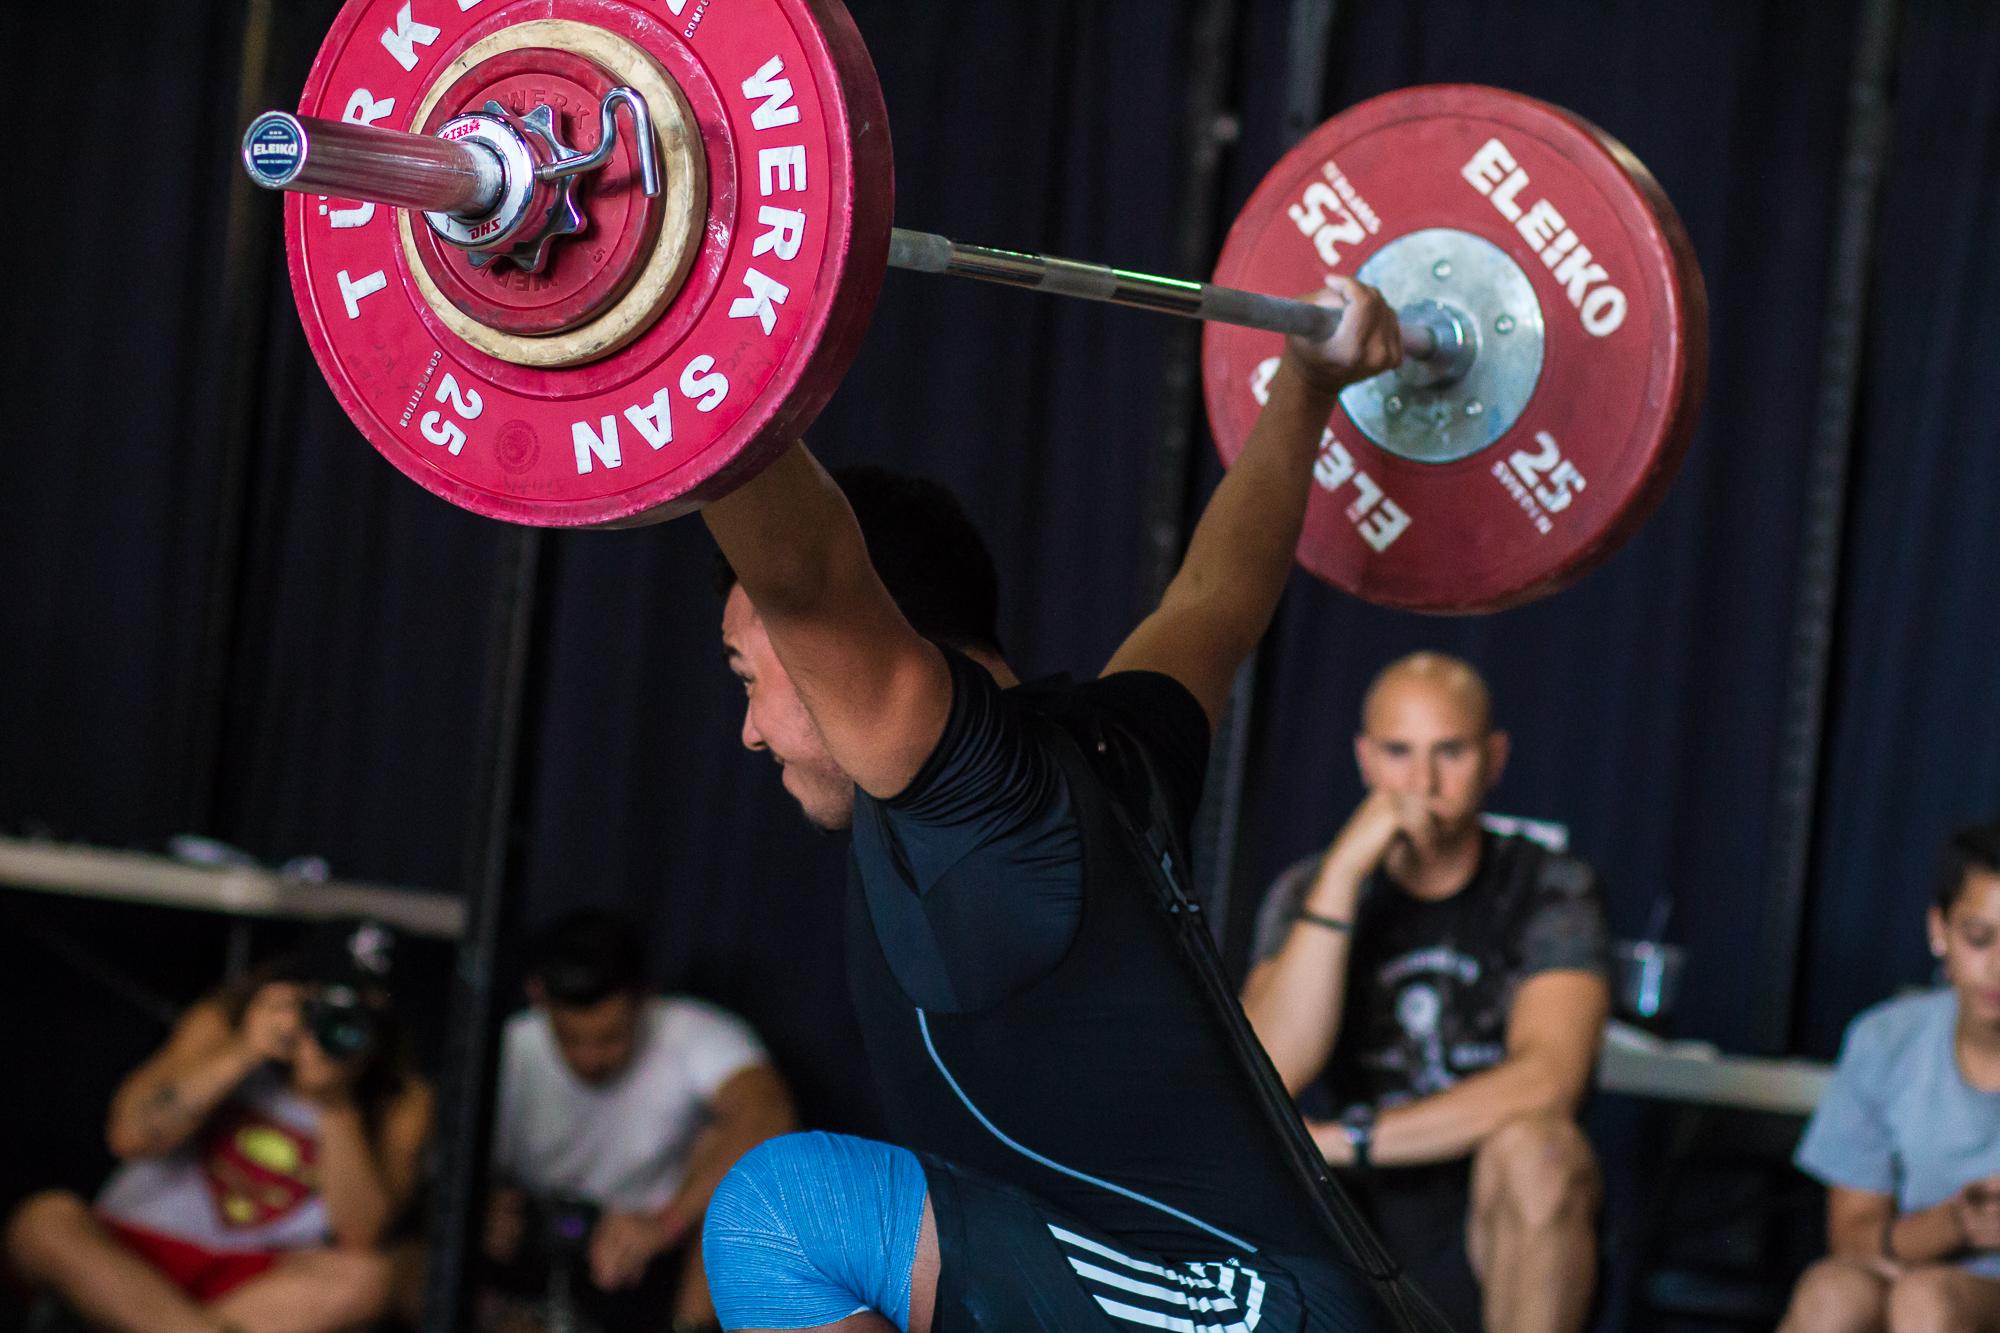 new-york-weightlifting-academy-sport-olympic-weightlifting-coach-danny-casey-weightlifters-competing (63 of 100).jpg